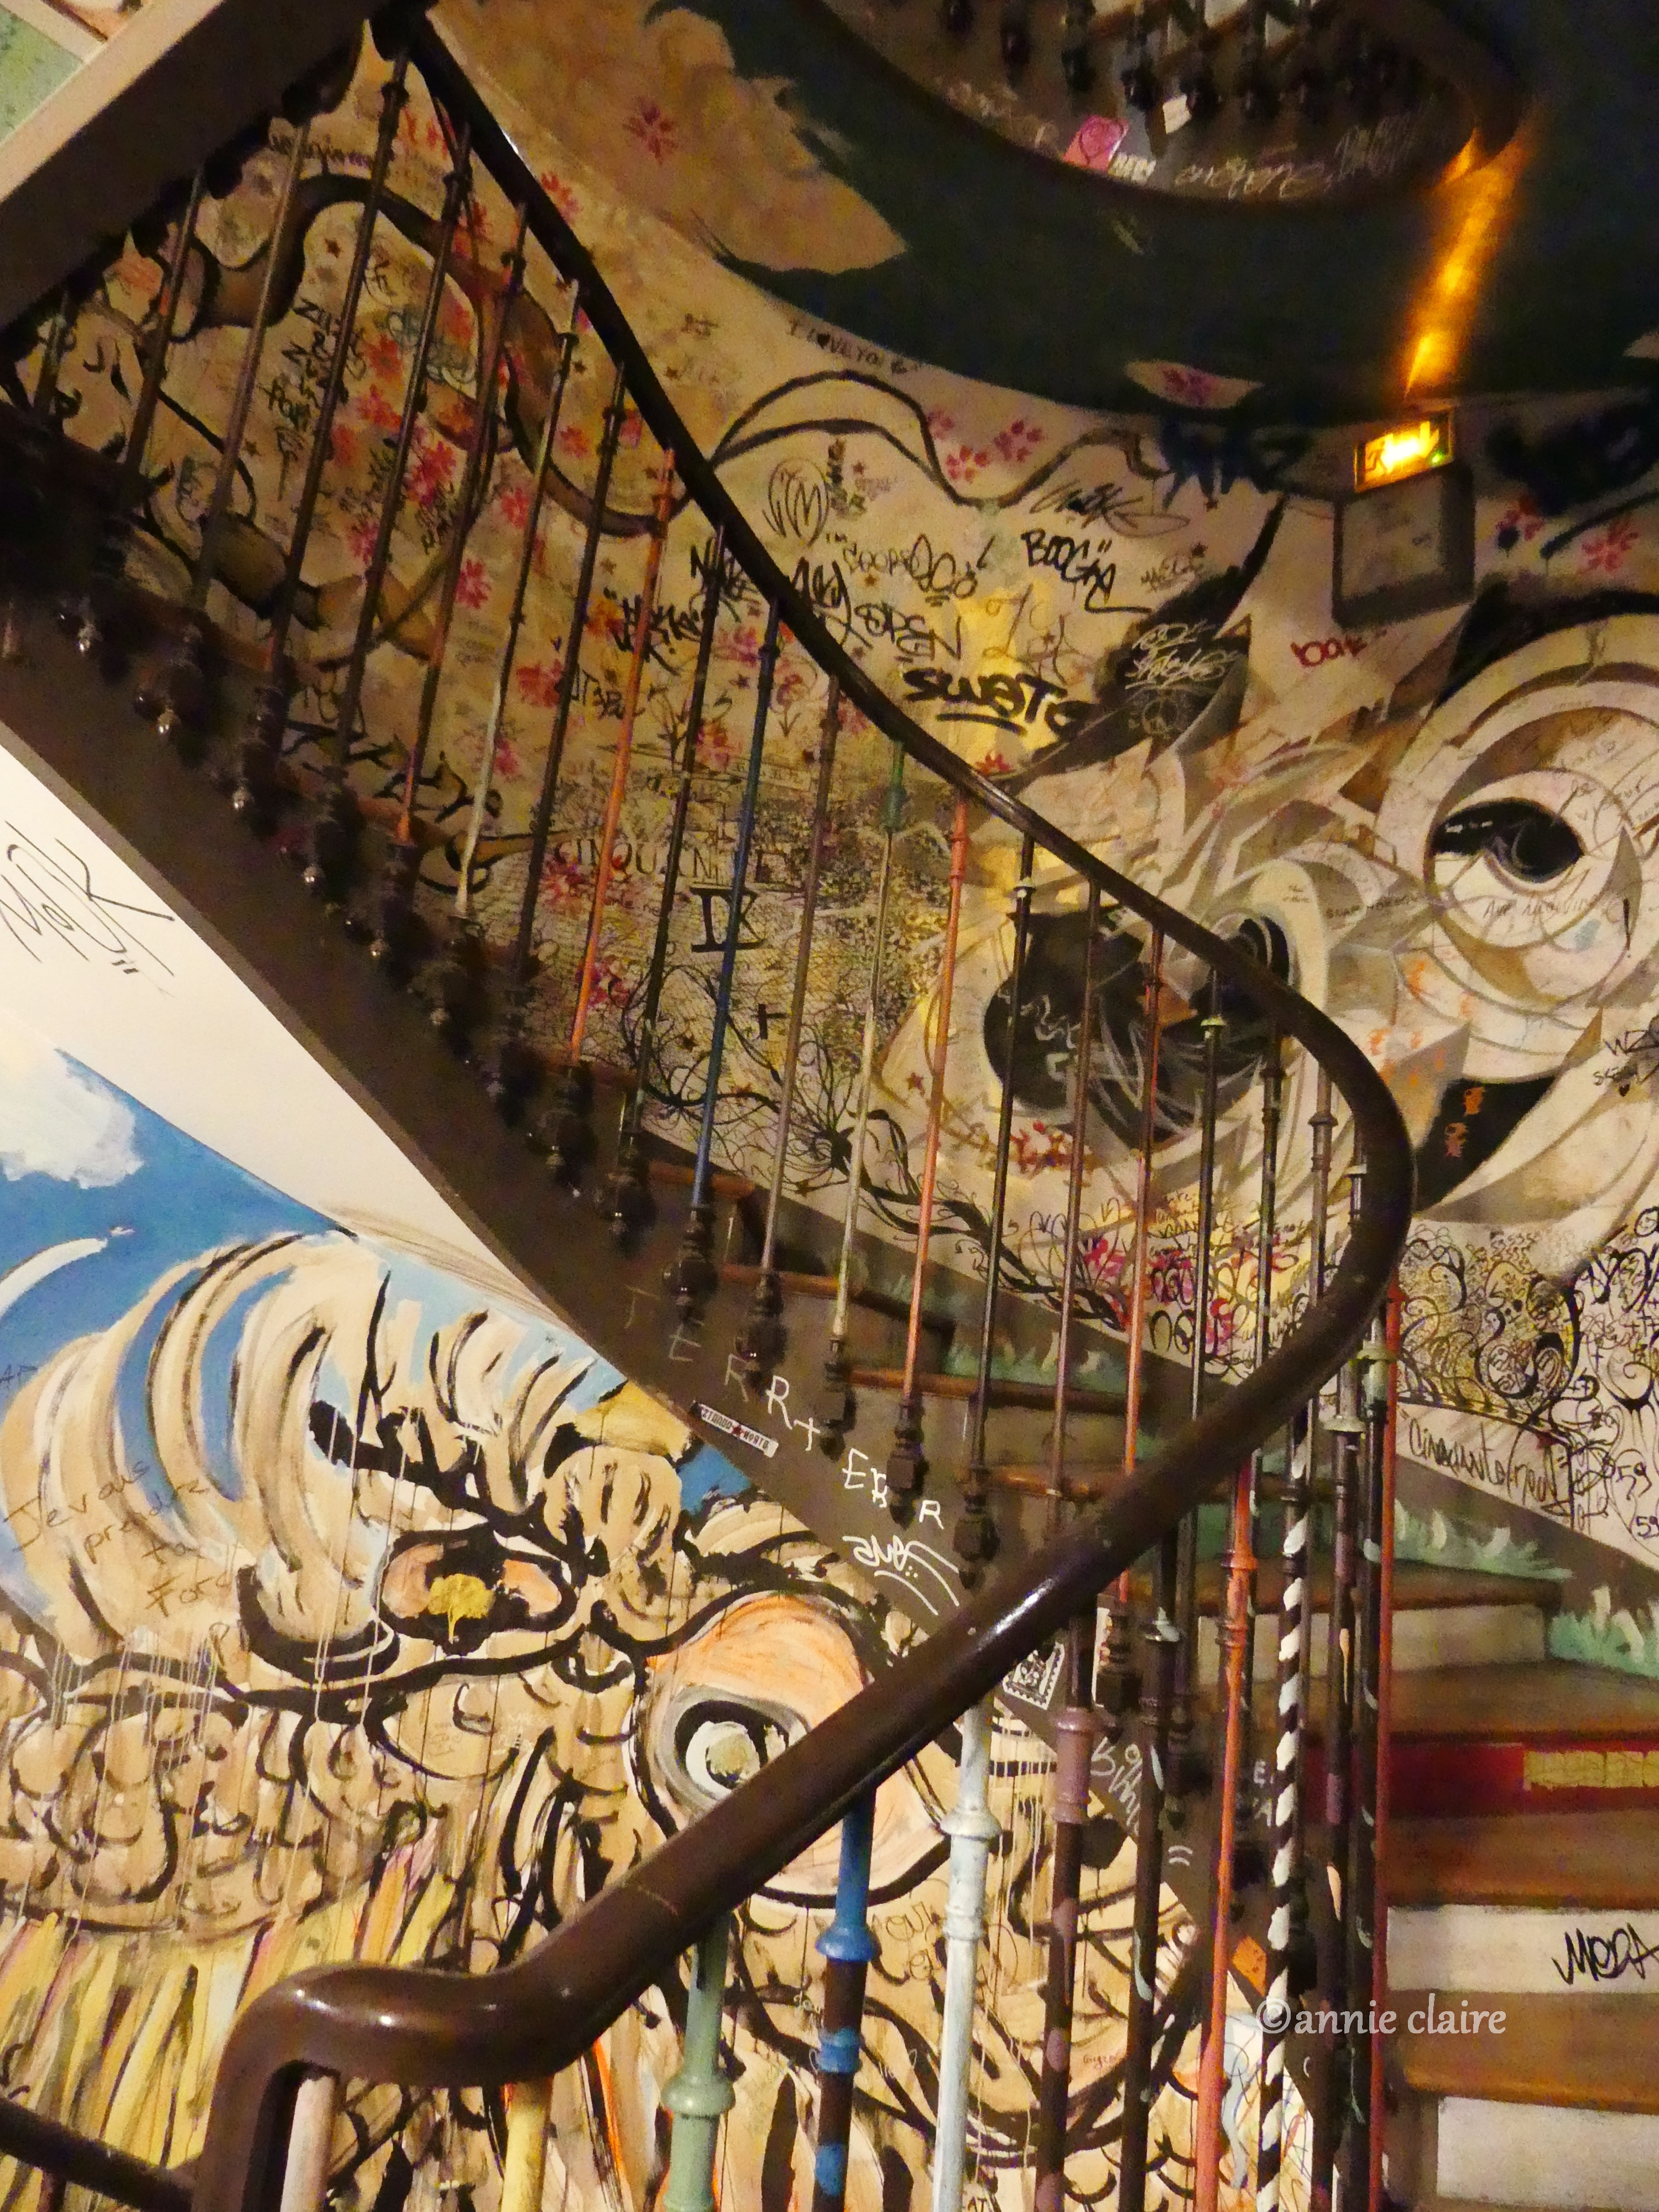 L'escalier du 59 rue de Rivoli ©annie claire 15.10.2016